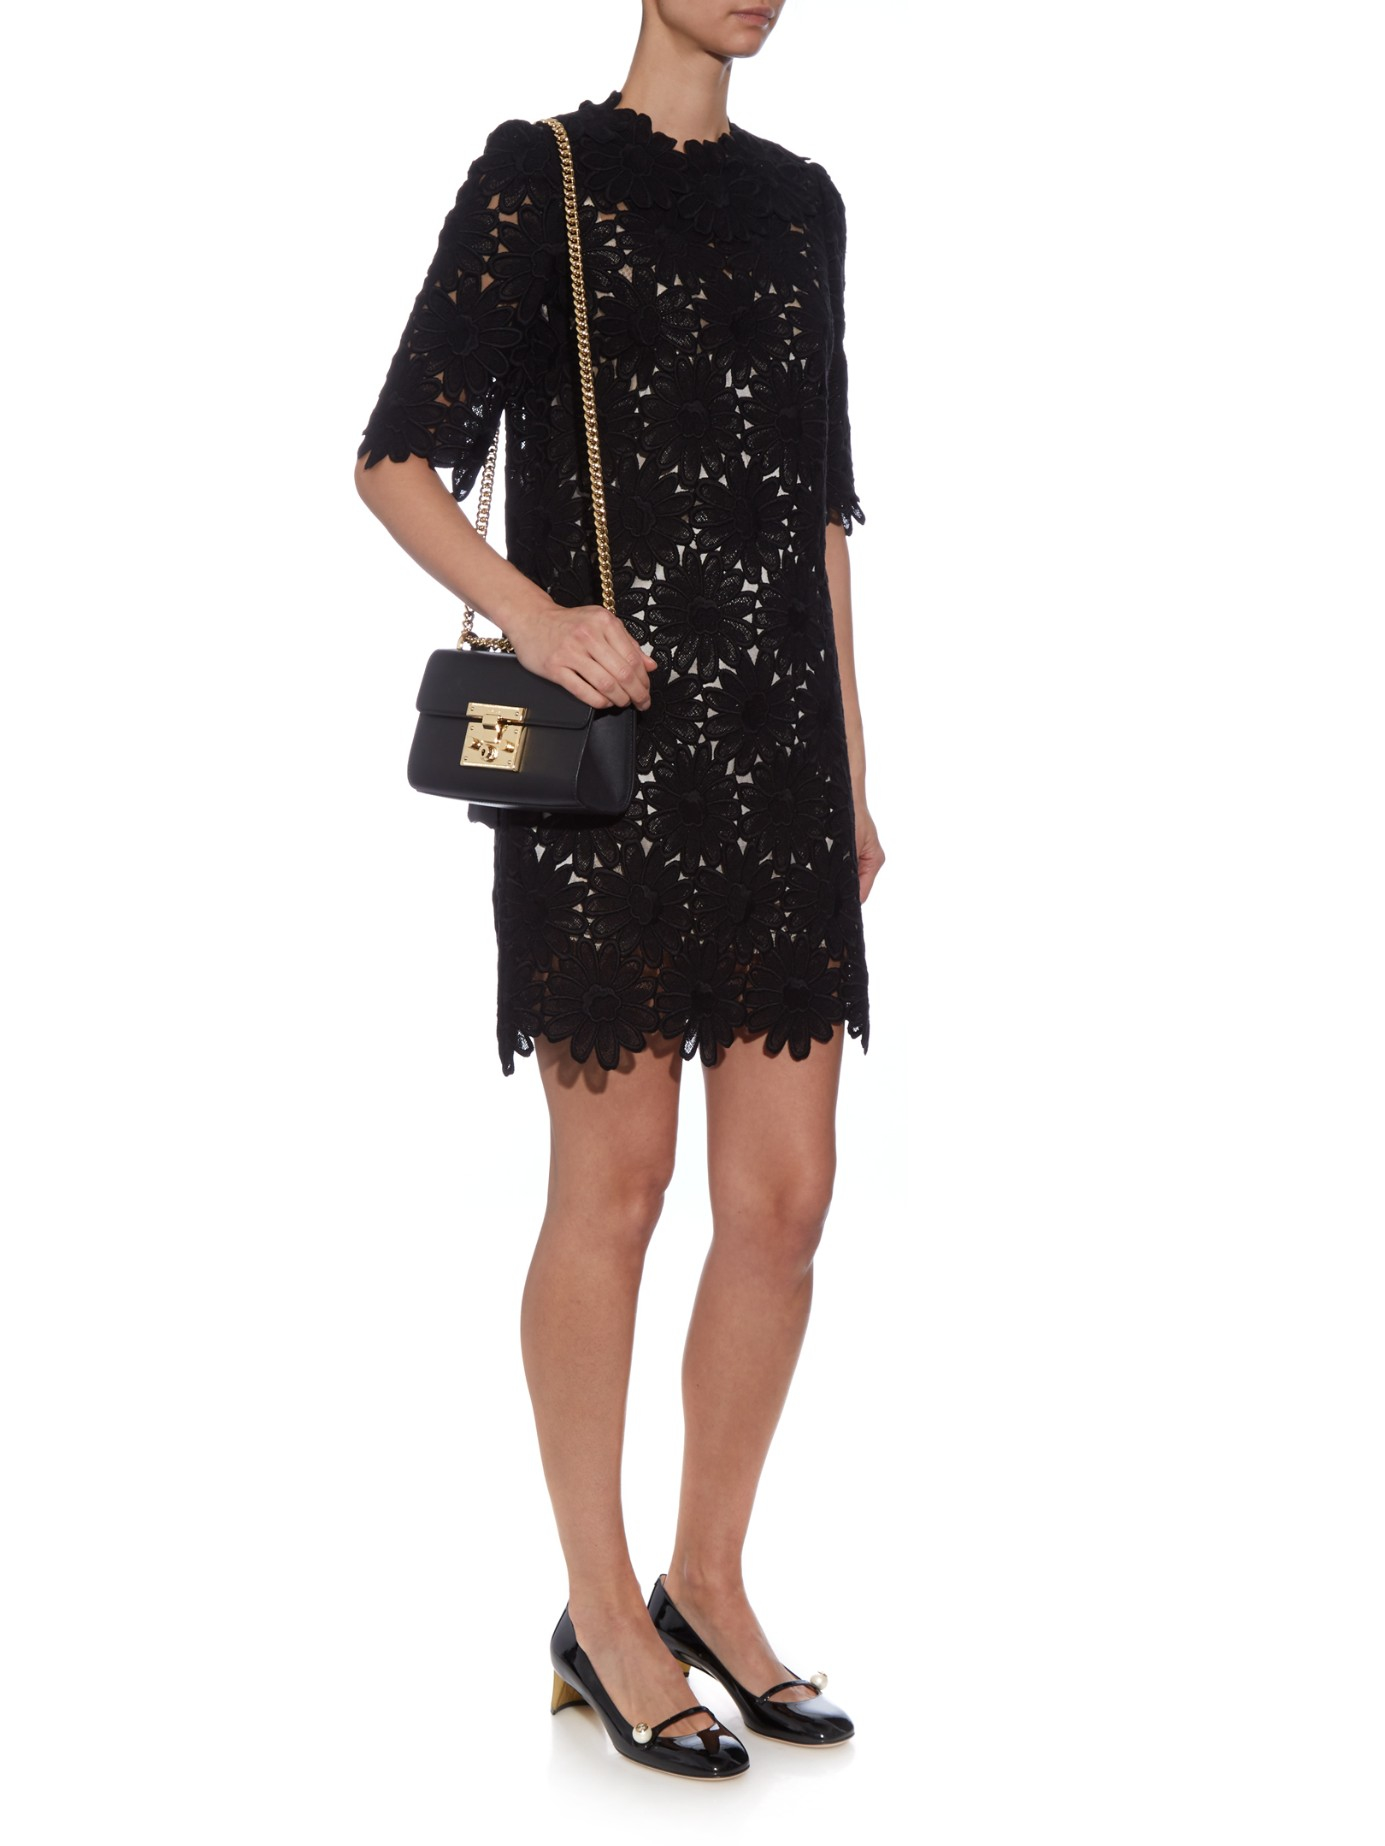 1a30e7c866d7 Lyst - Gucci Arielle Patent-leather Pumps in Black